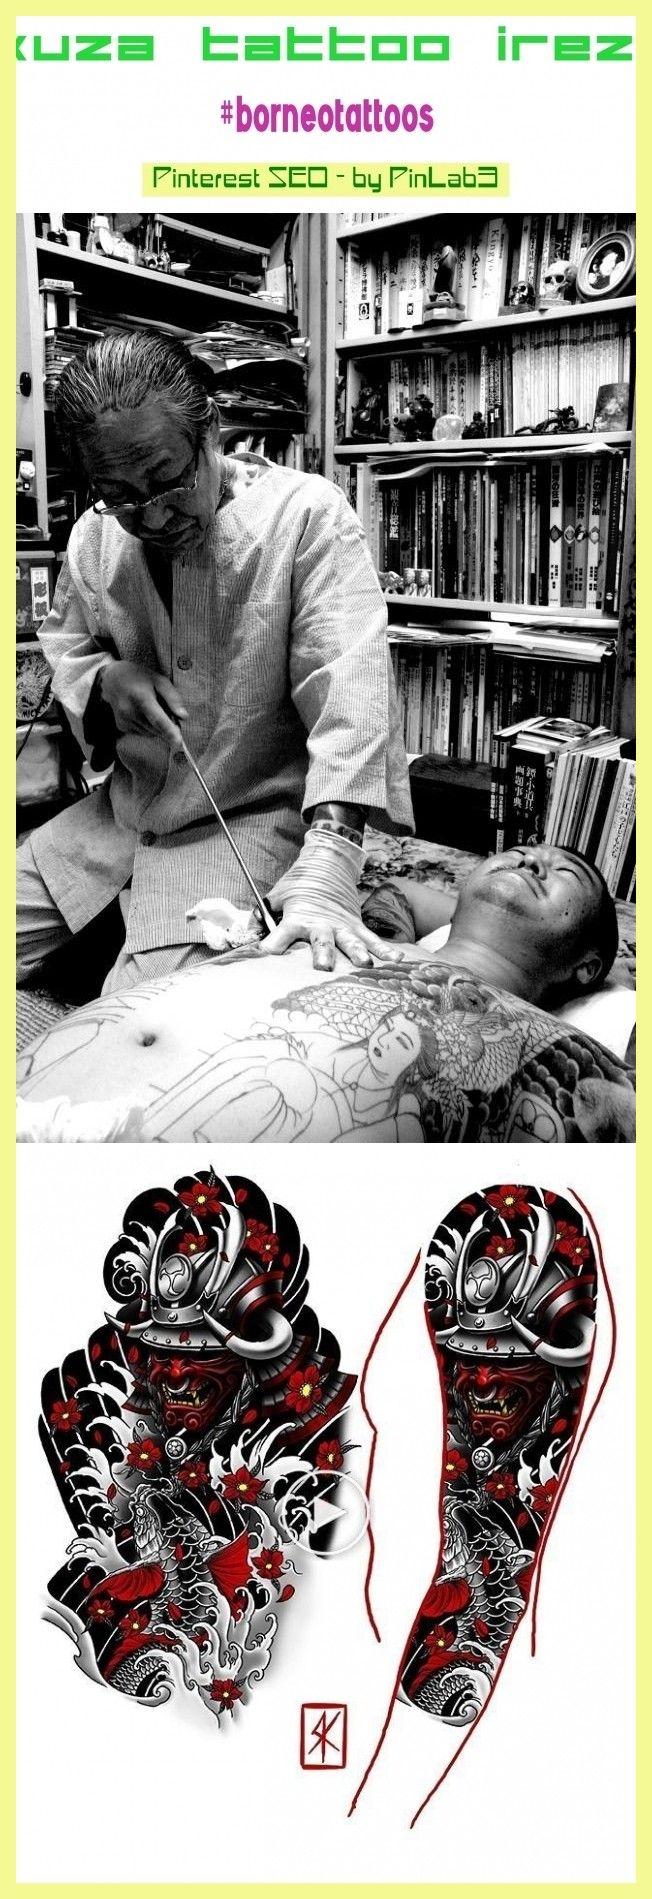 yakuza tattoo irezumi yakuza tattoo irezumi